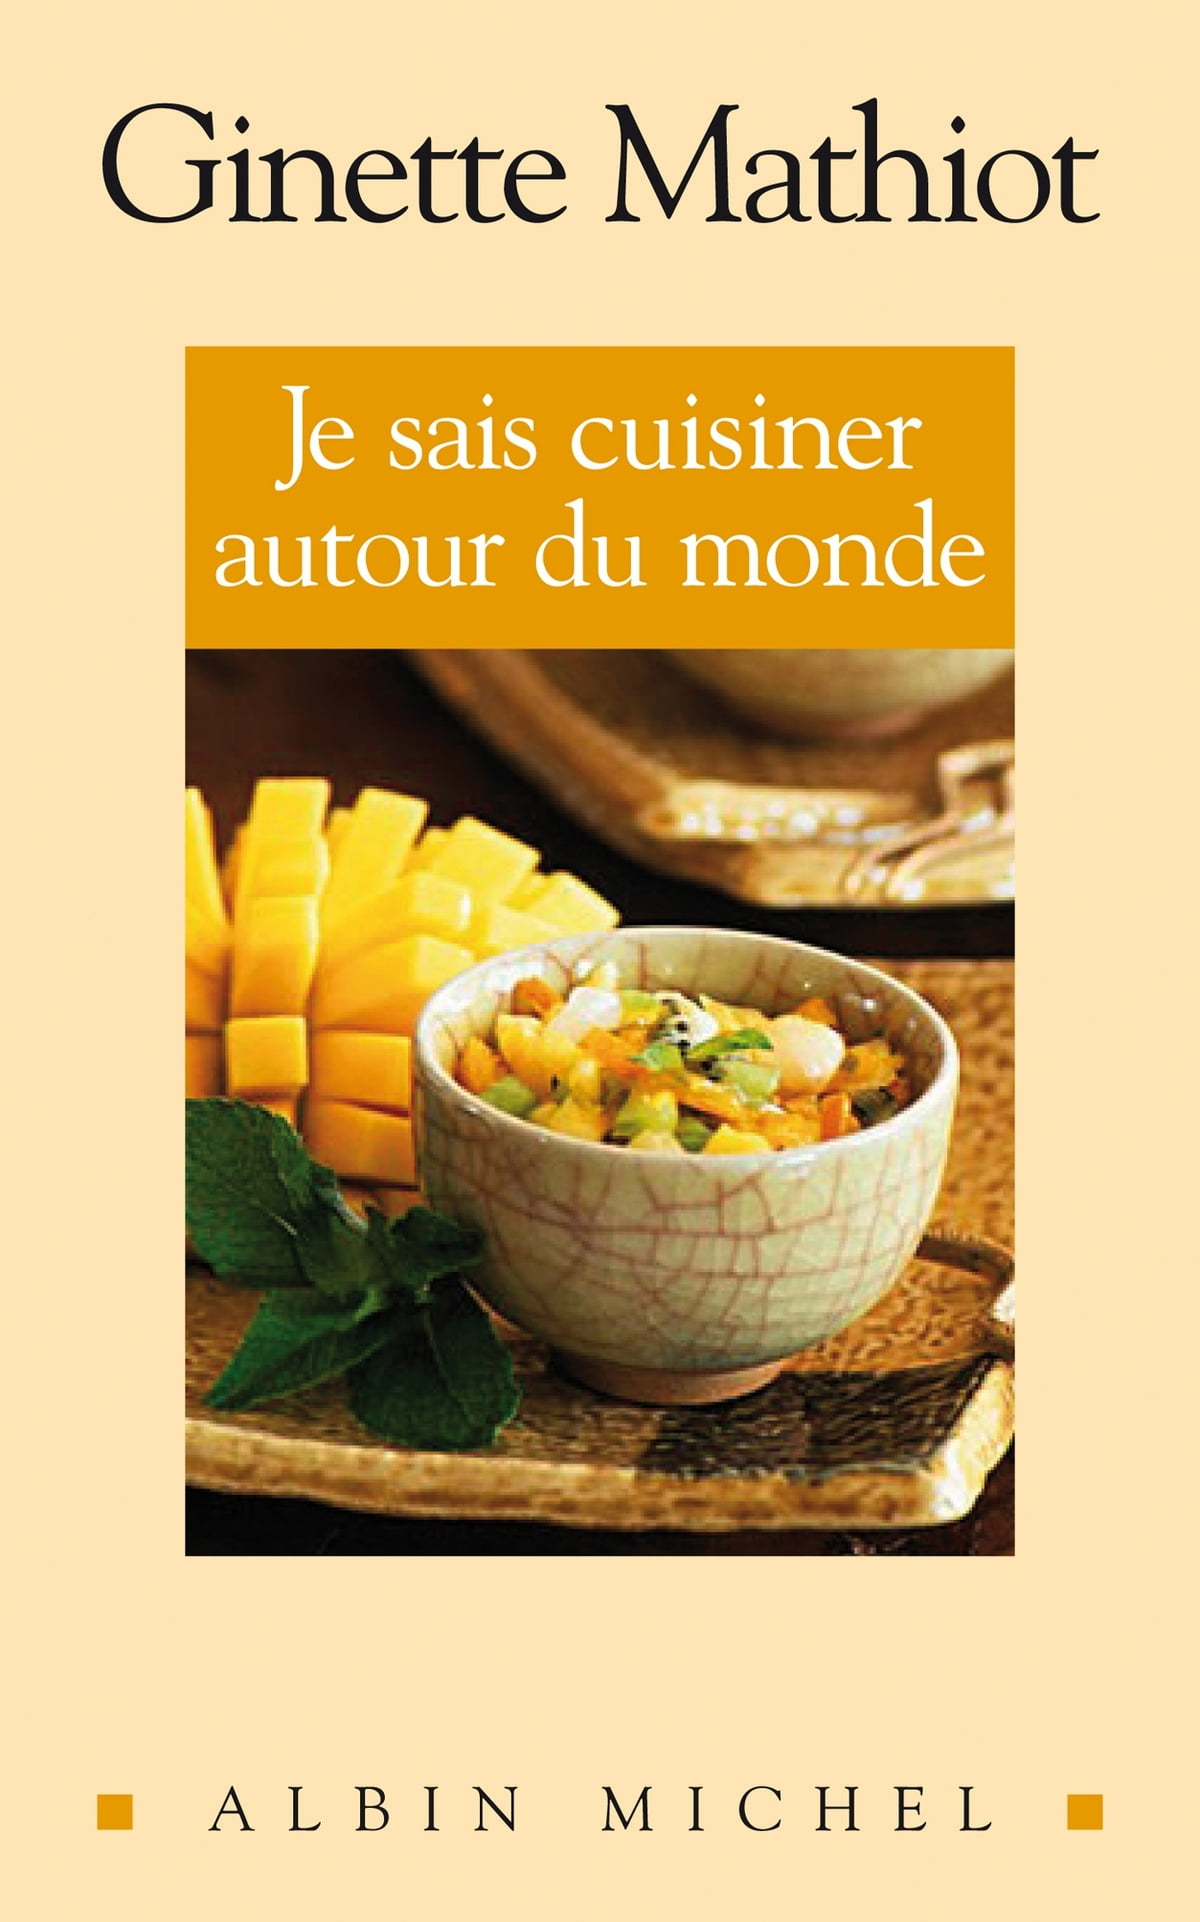 Je Sais Cuisiner Ginette Mathiot : cuisiner, ginette, mathiot, Cuisiner, Autour, Monde, EBook, Ginette, Mathiot, 9782226197214, Rakuten, Canada